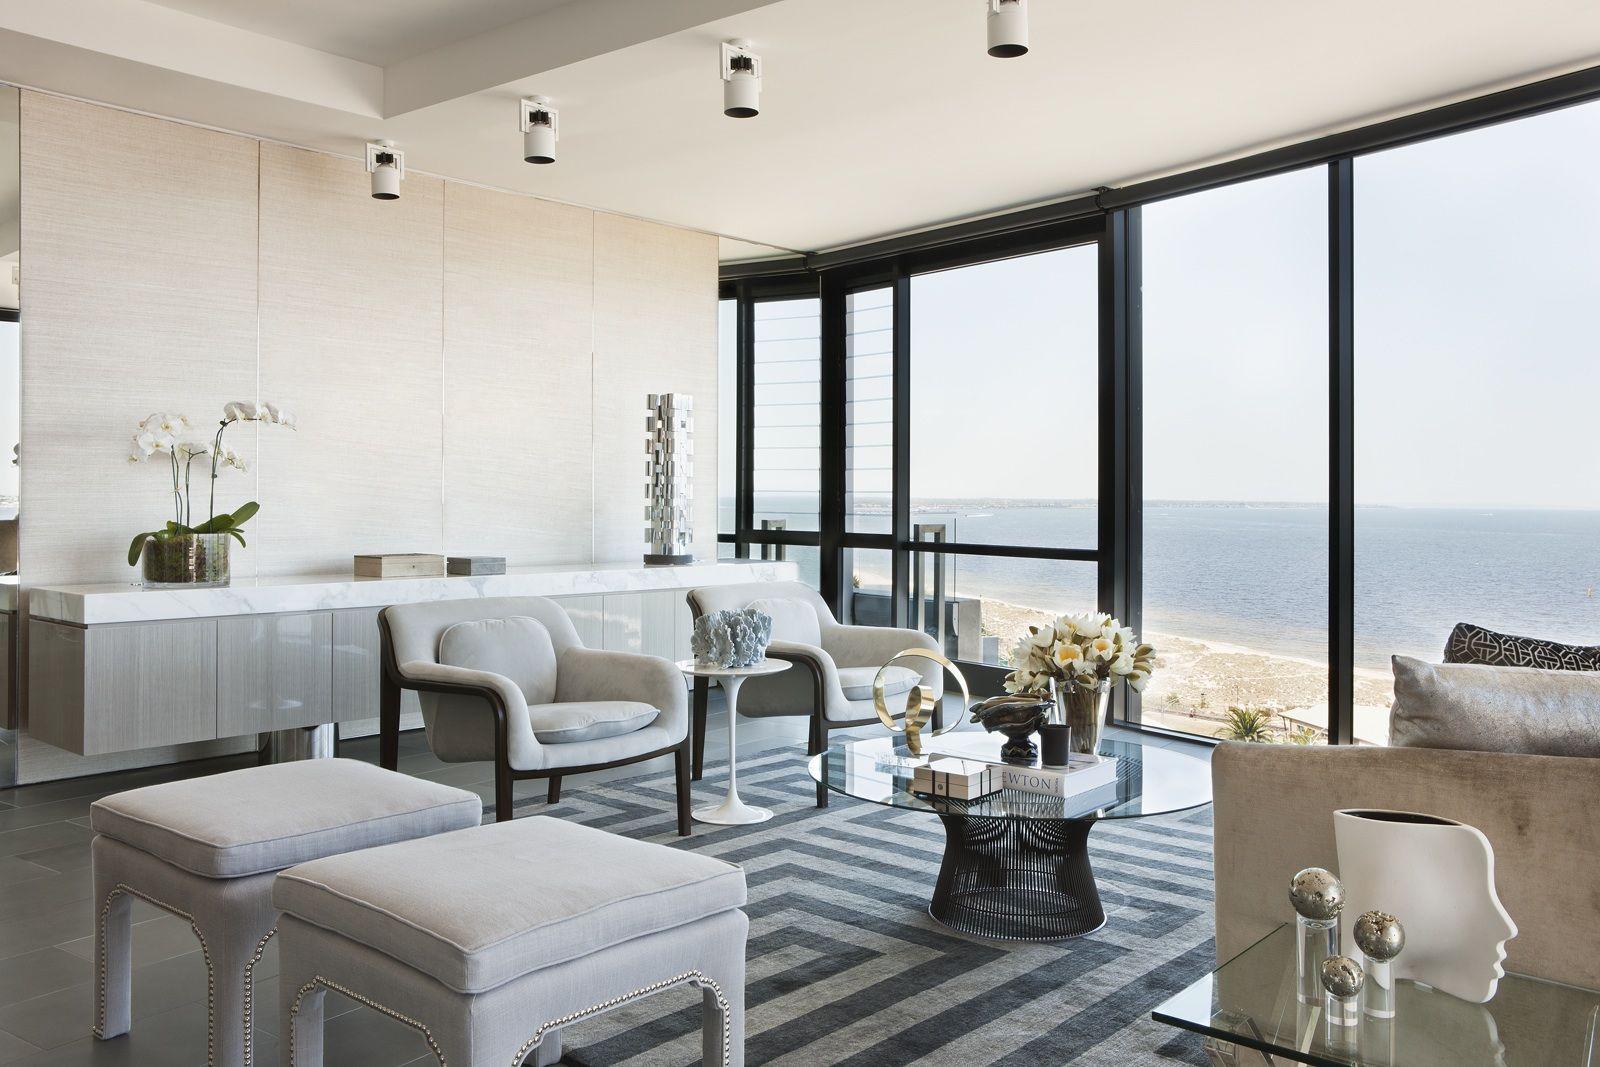 Belle coco republic interior design award finalists for Apartment design awards